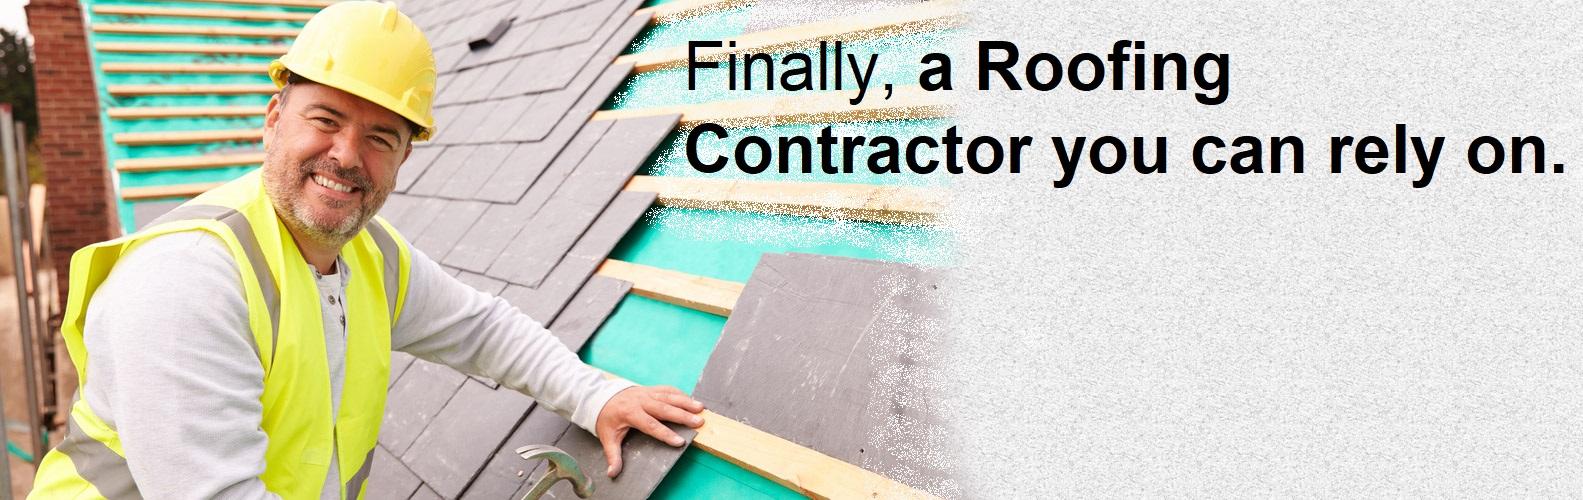 1 Balch Springs Roof Repair | The experts of Roof Repair in Houston !